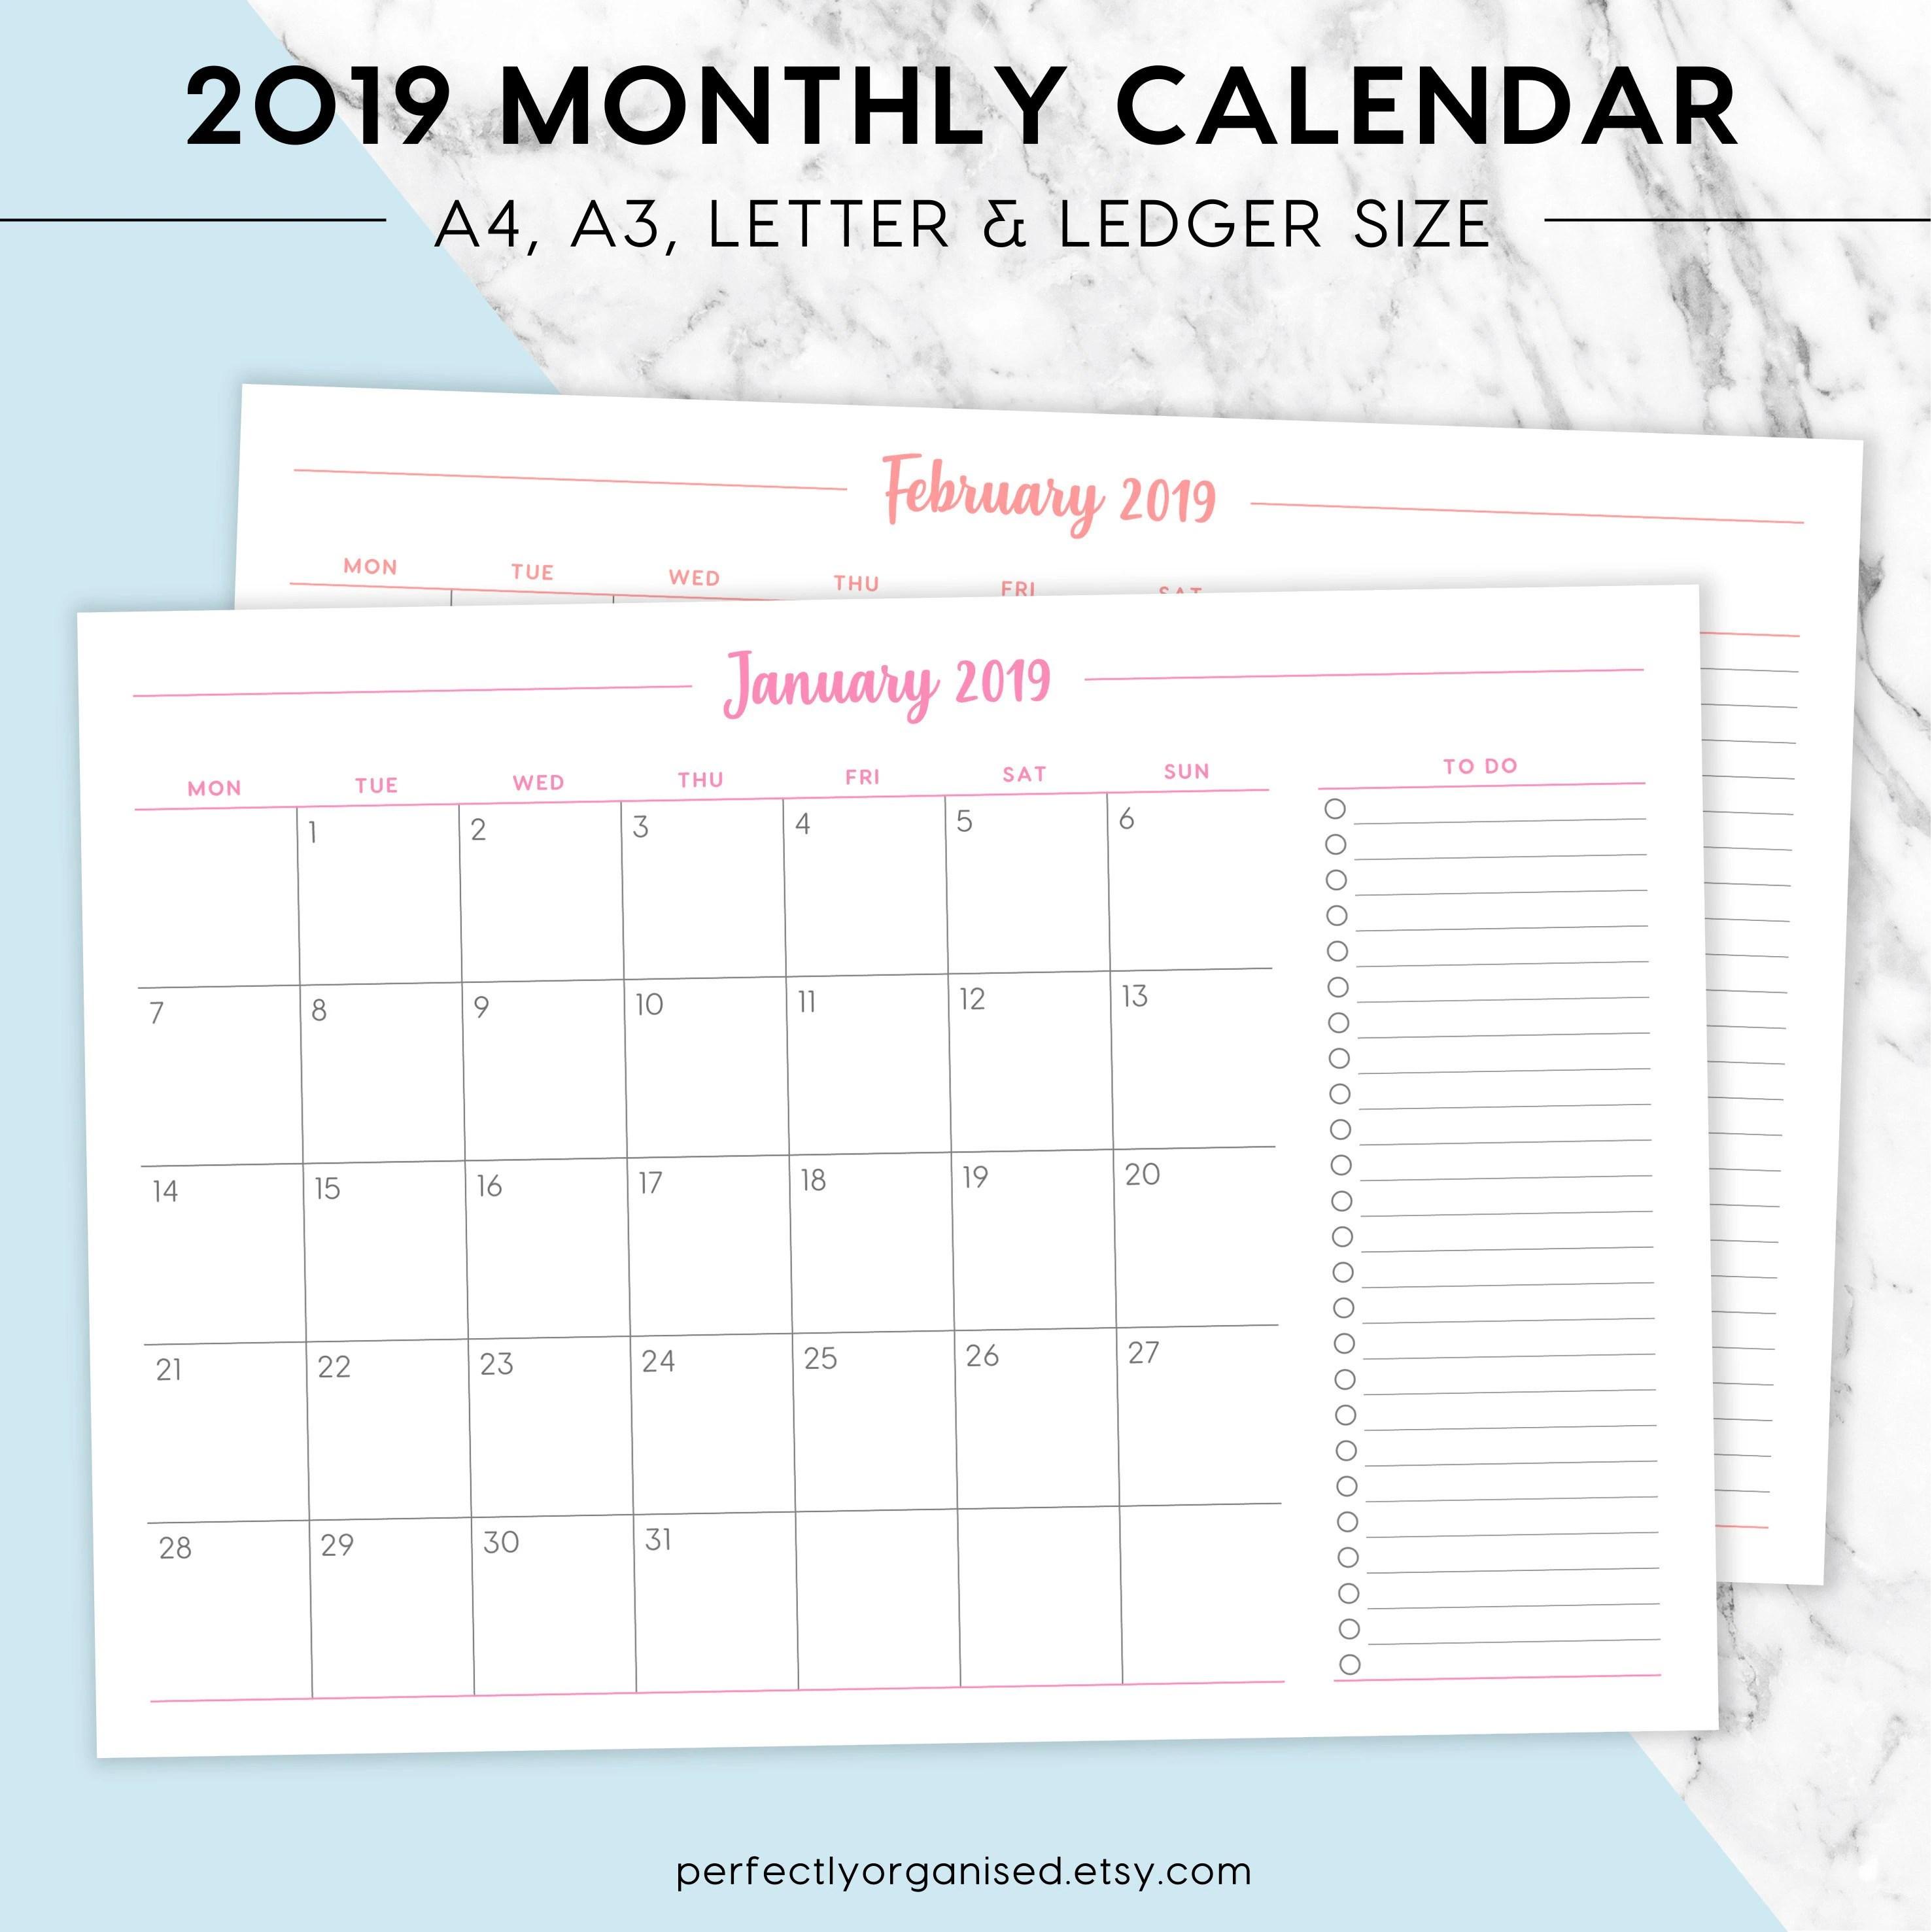 NEW 2019 Monthly Calendar Printable A4 A3 Letter Ledger | Etsy